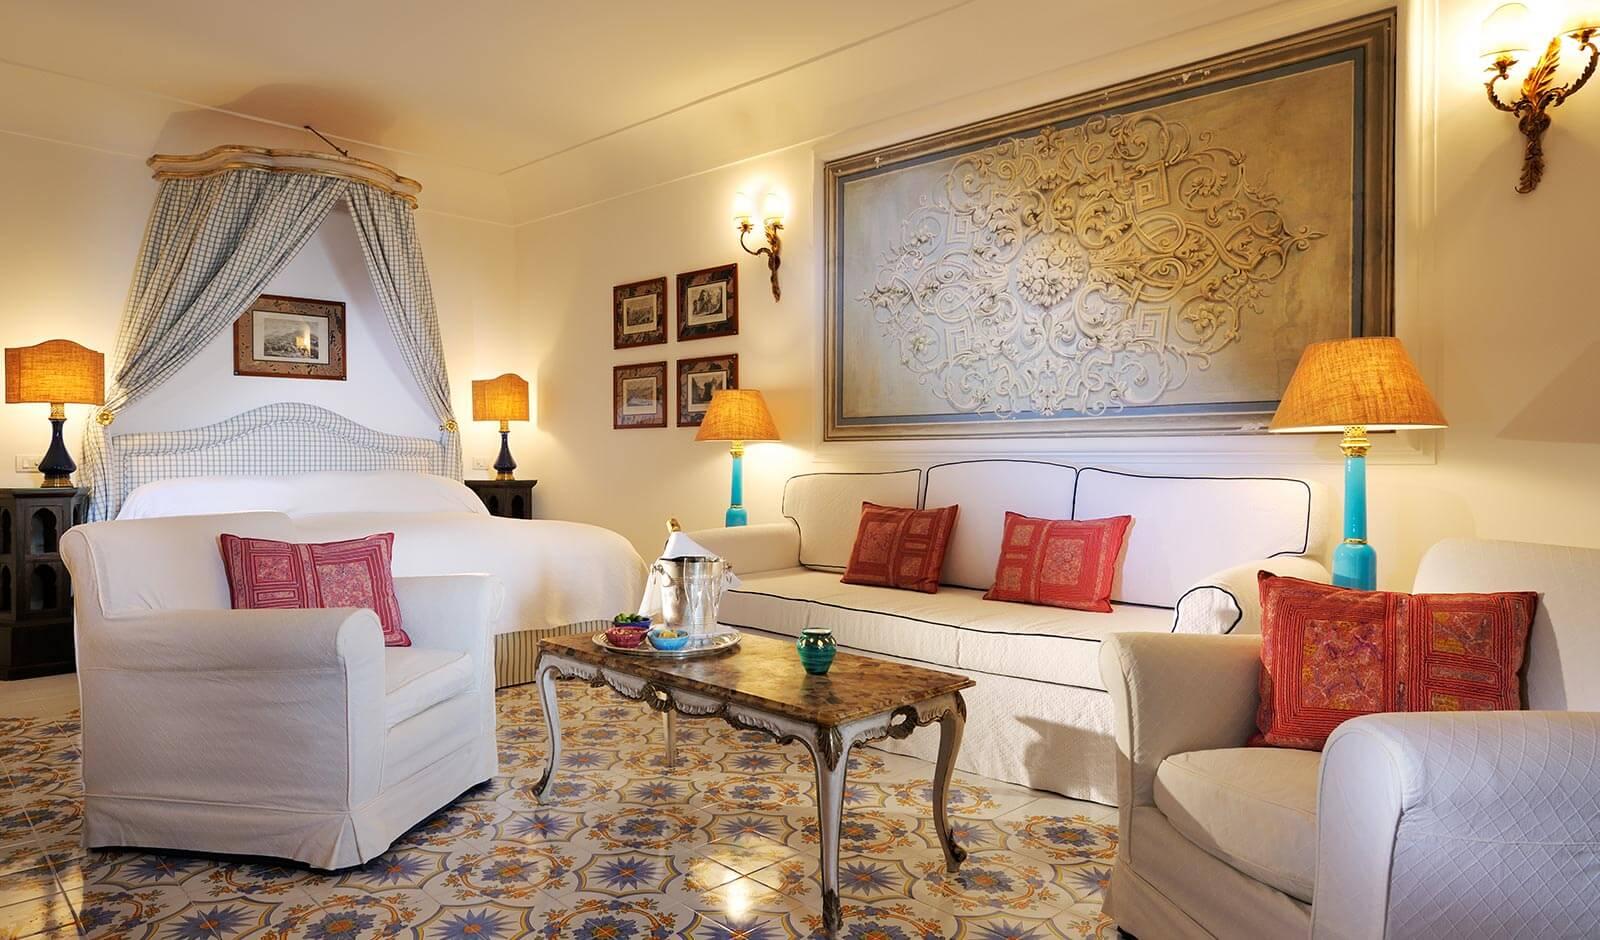 Une Suite de l'hôtel Sirenuse (Positano, Italie)